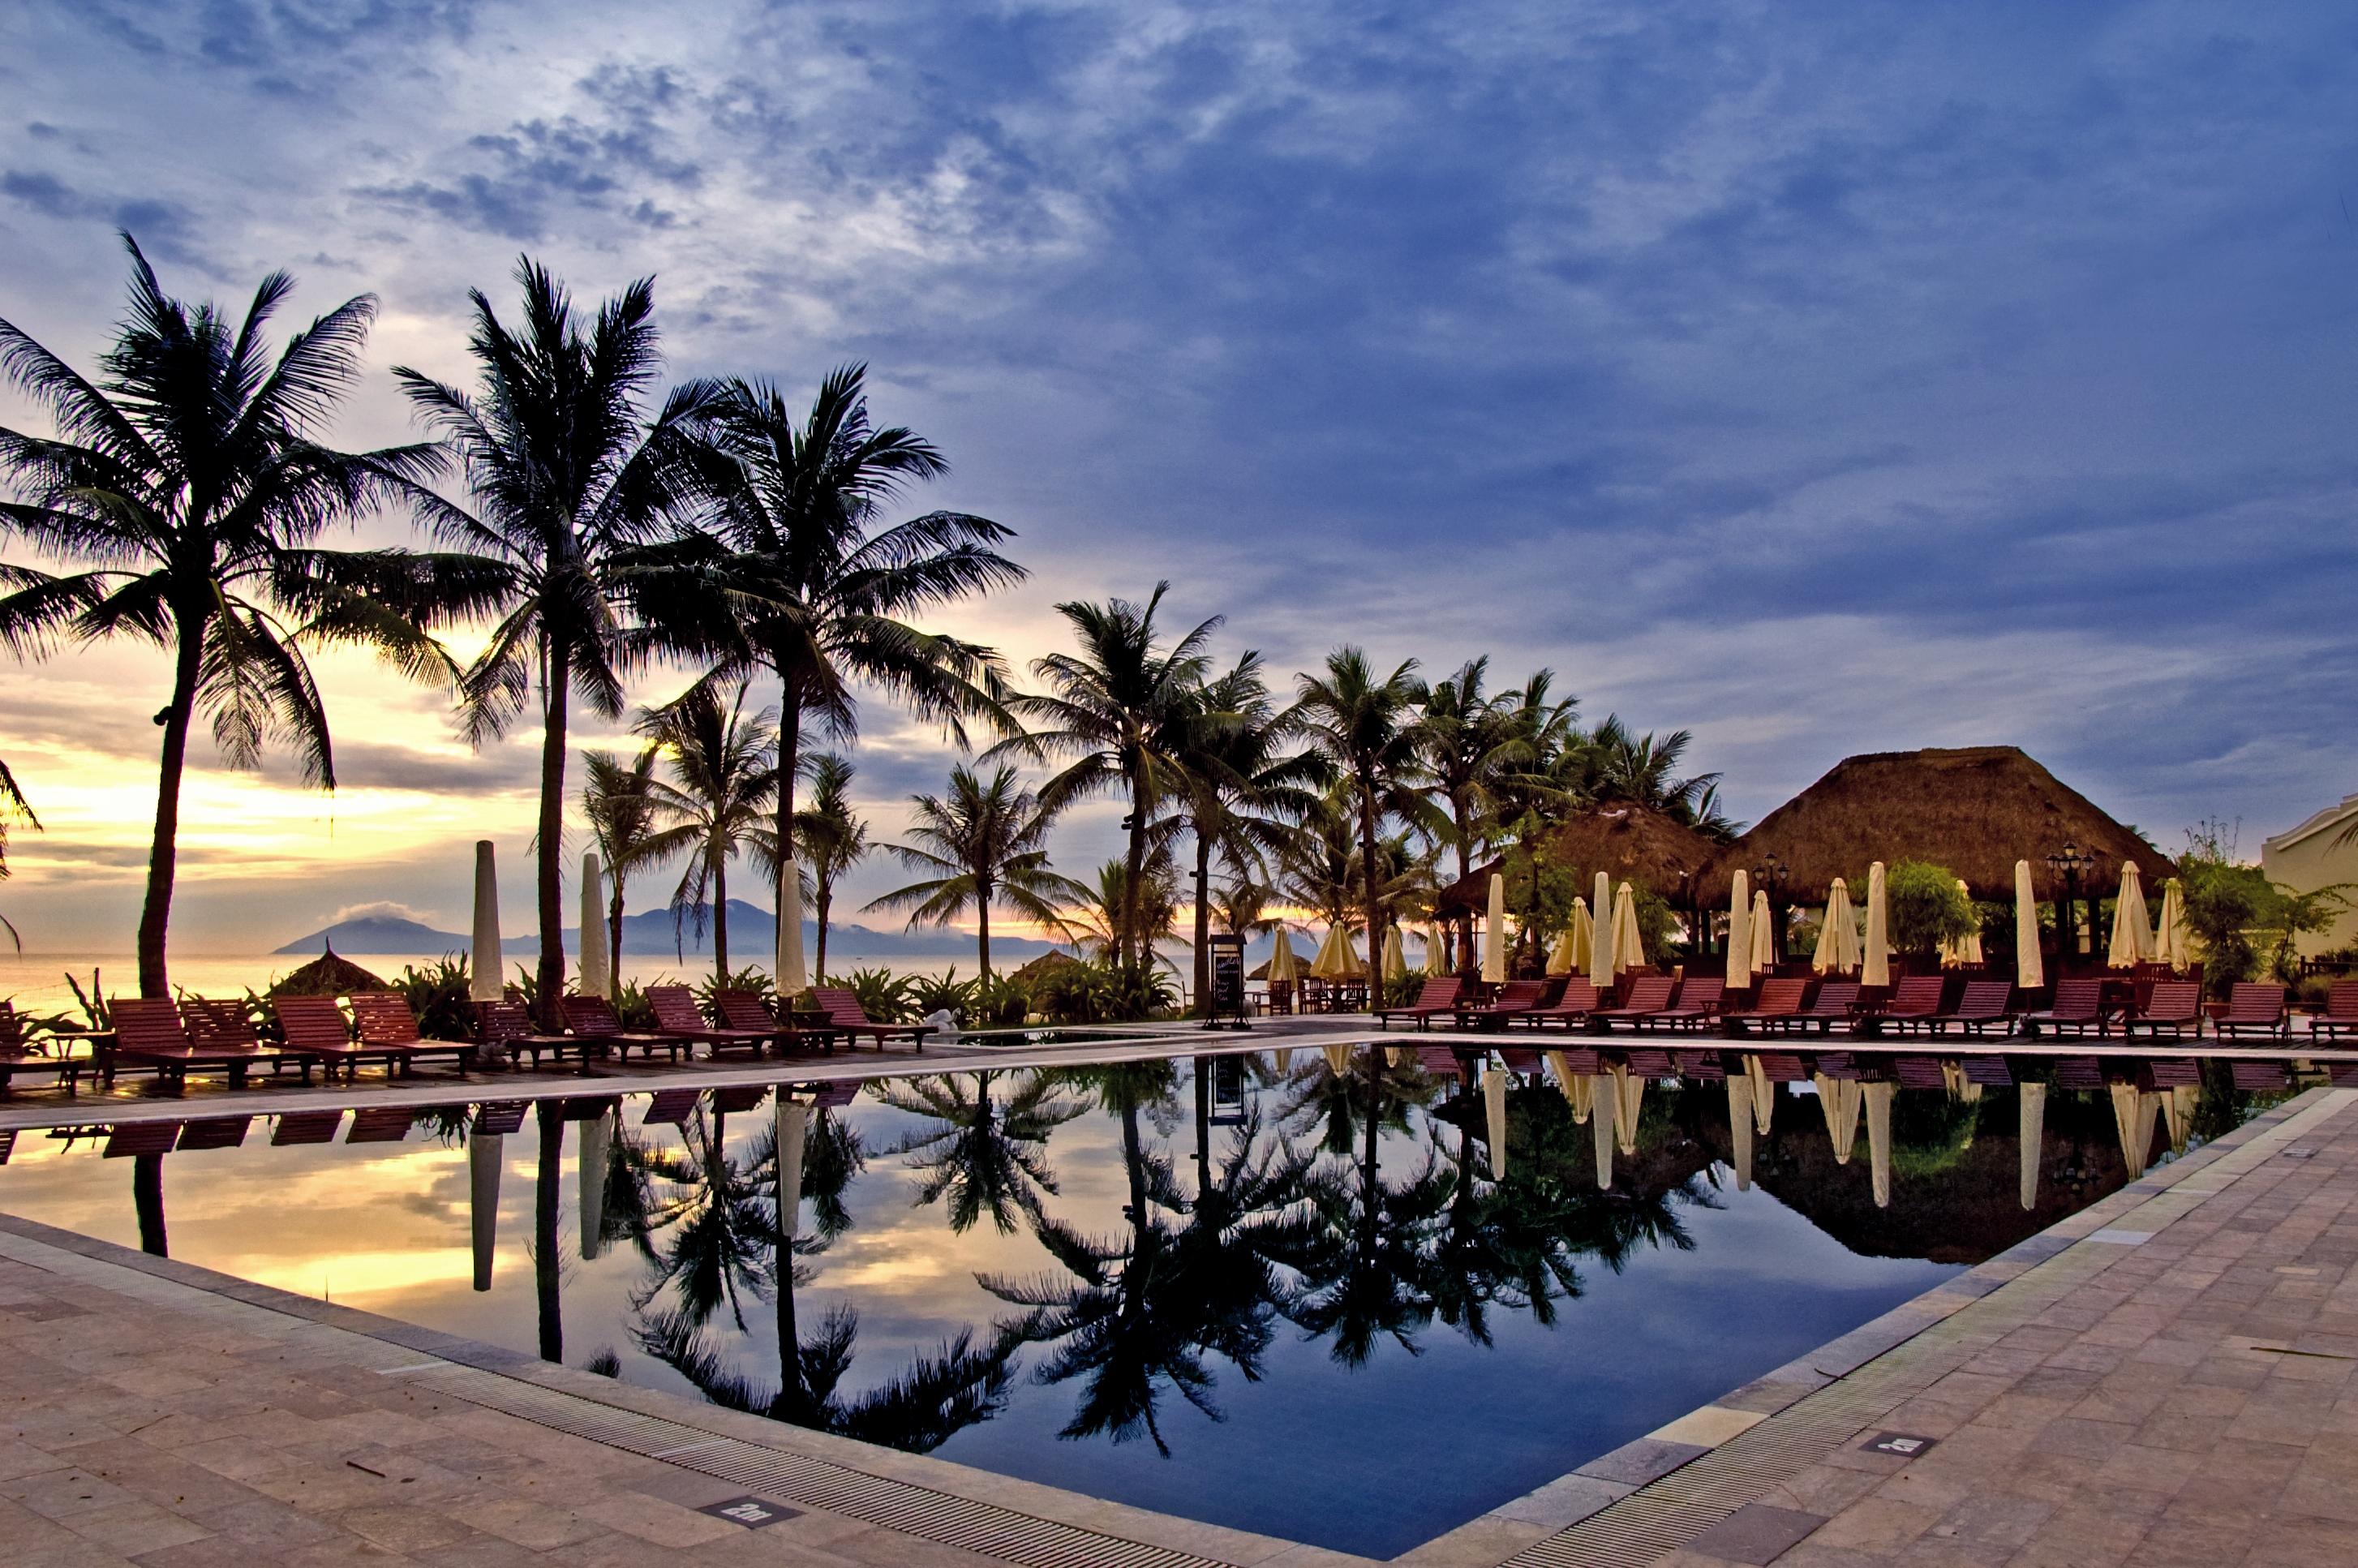 Victoria Hội An Beach Resort & Spa